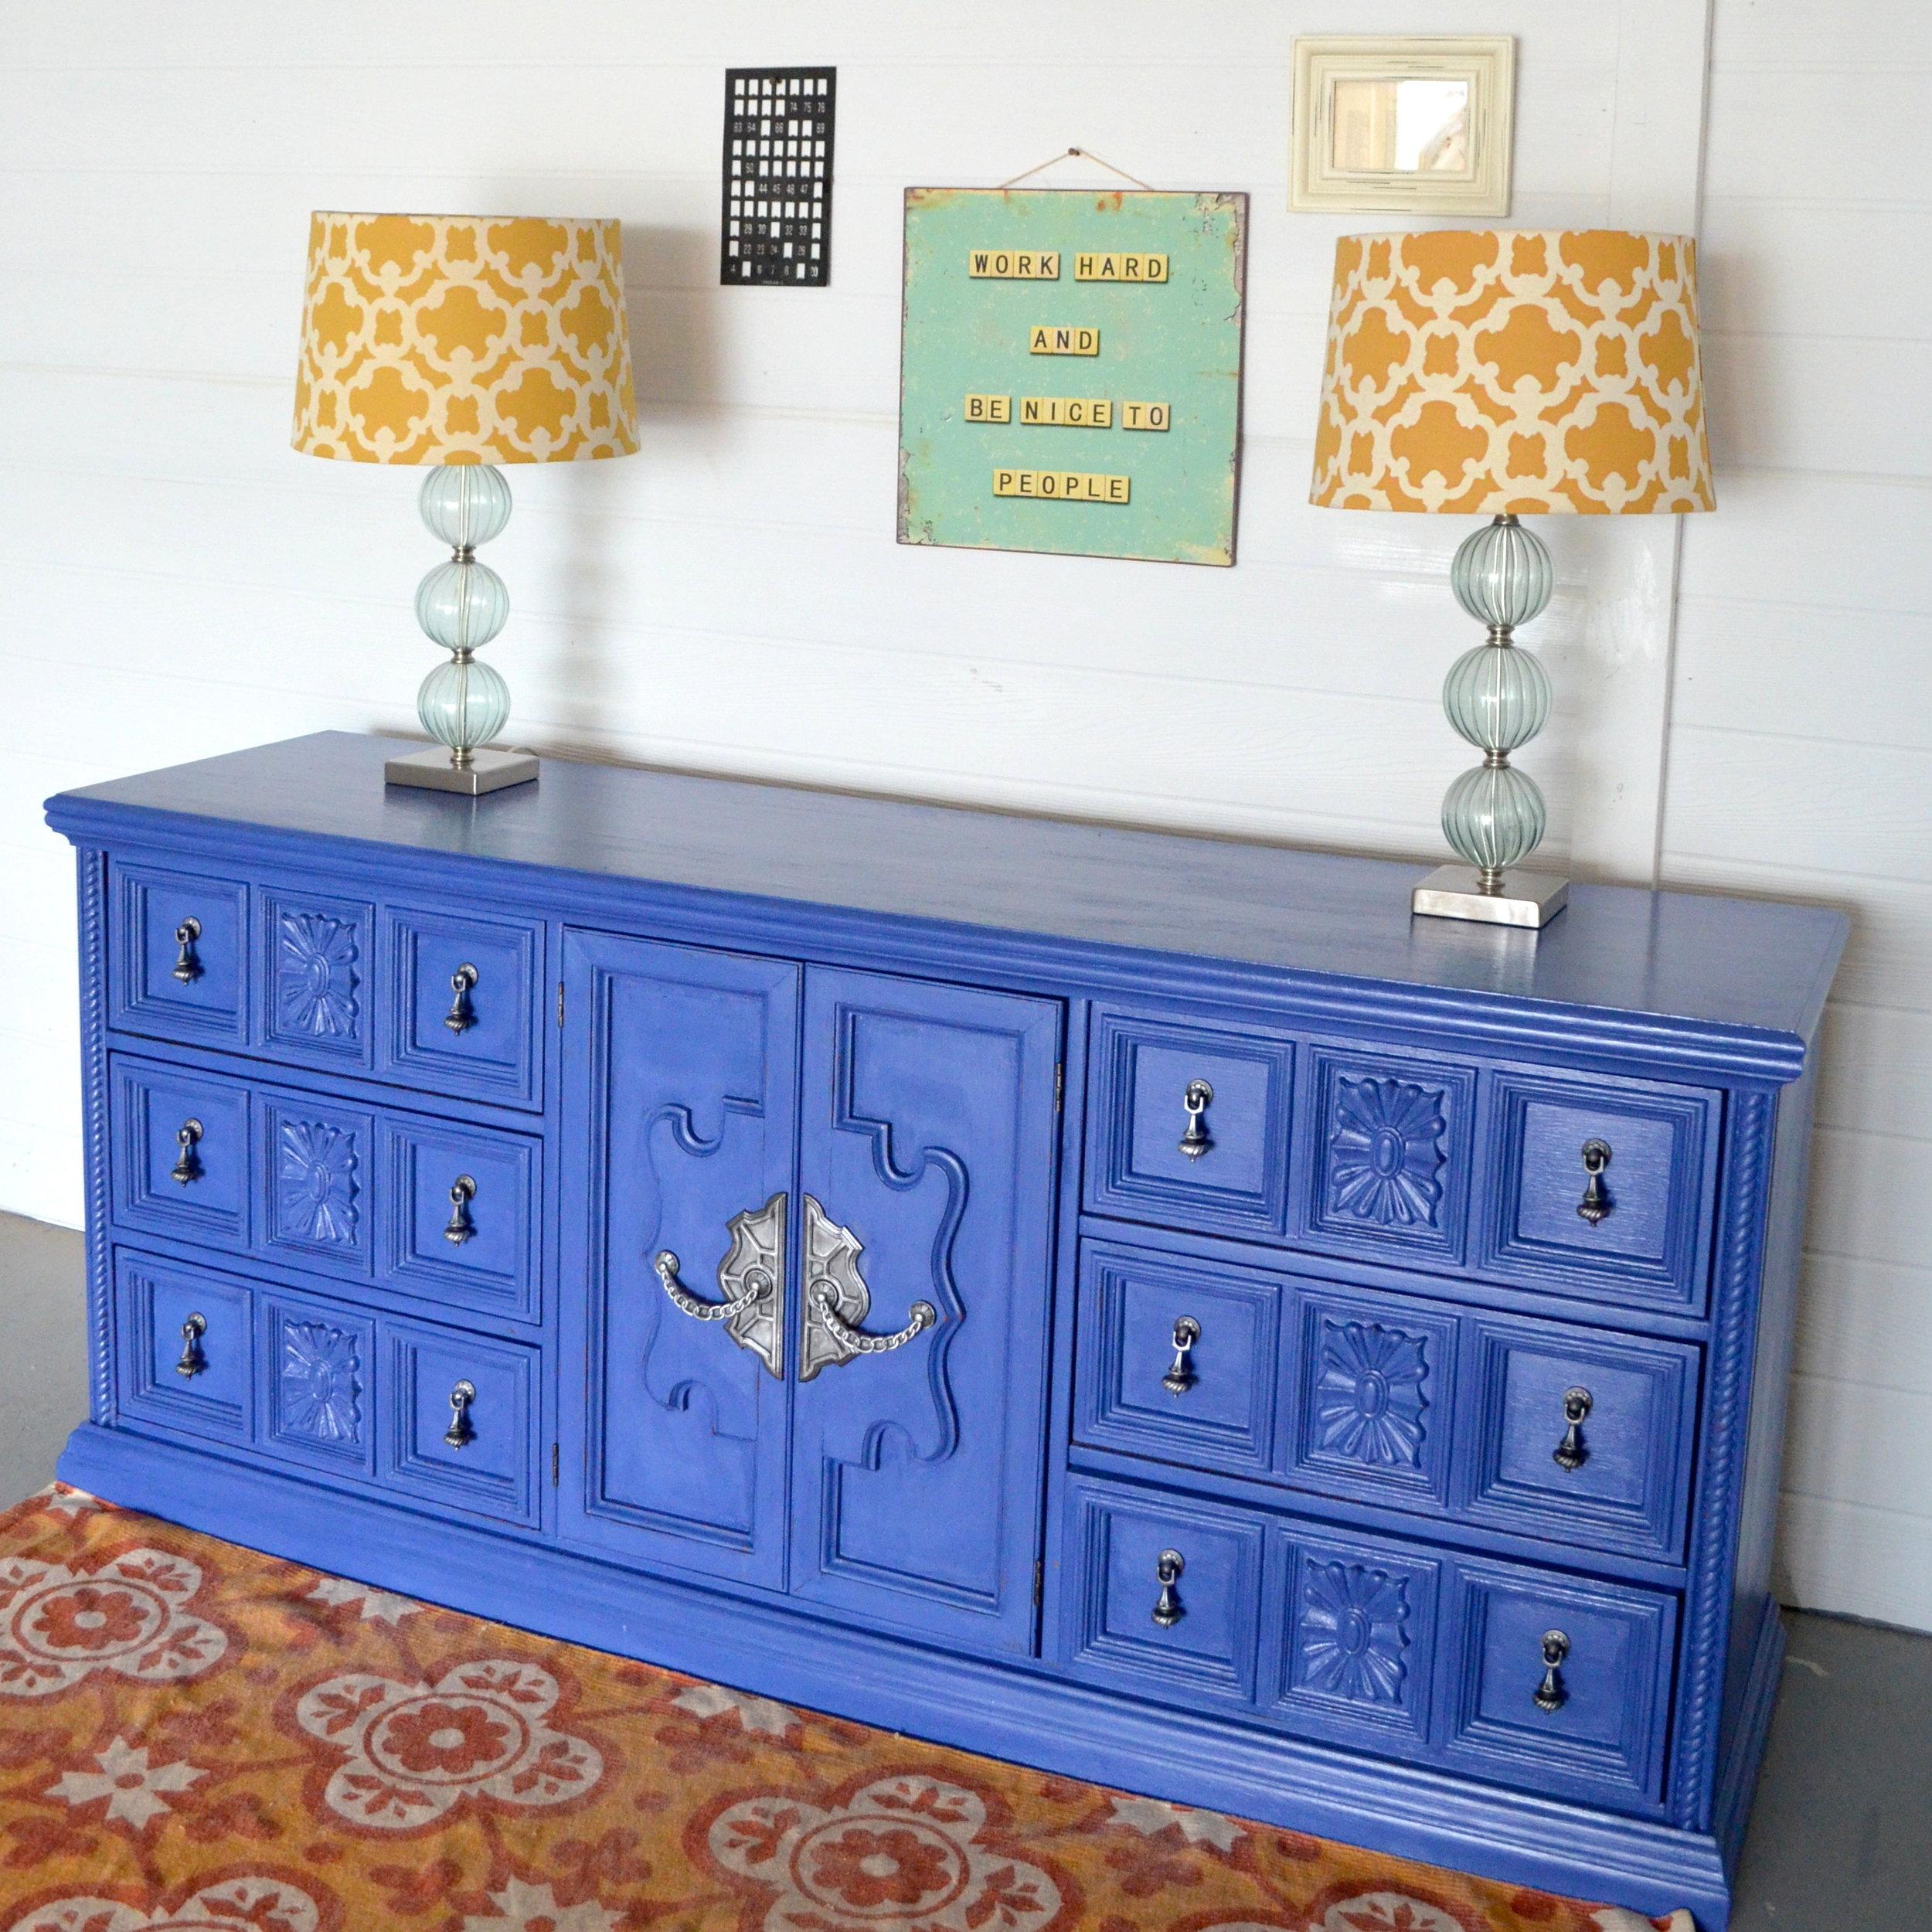 cece-caldwell-maine-harbor-blue-dresser-2.jpg